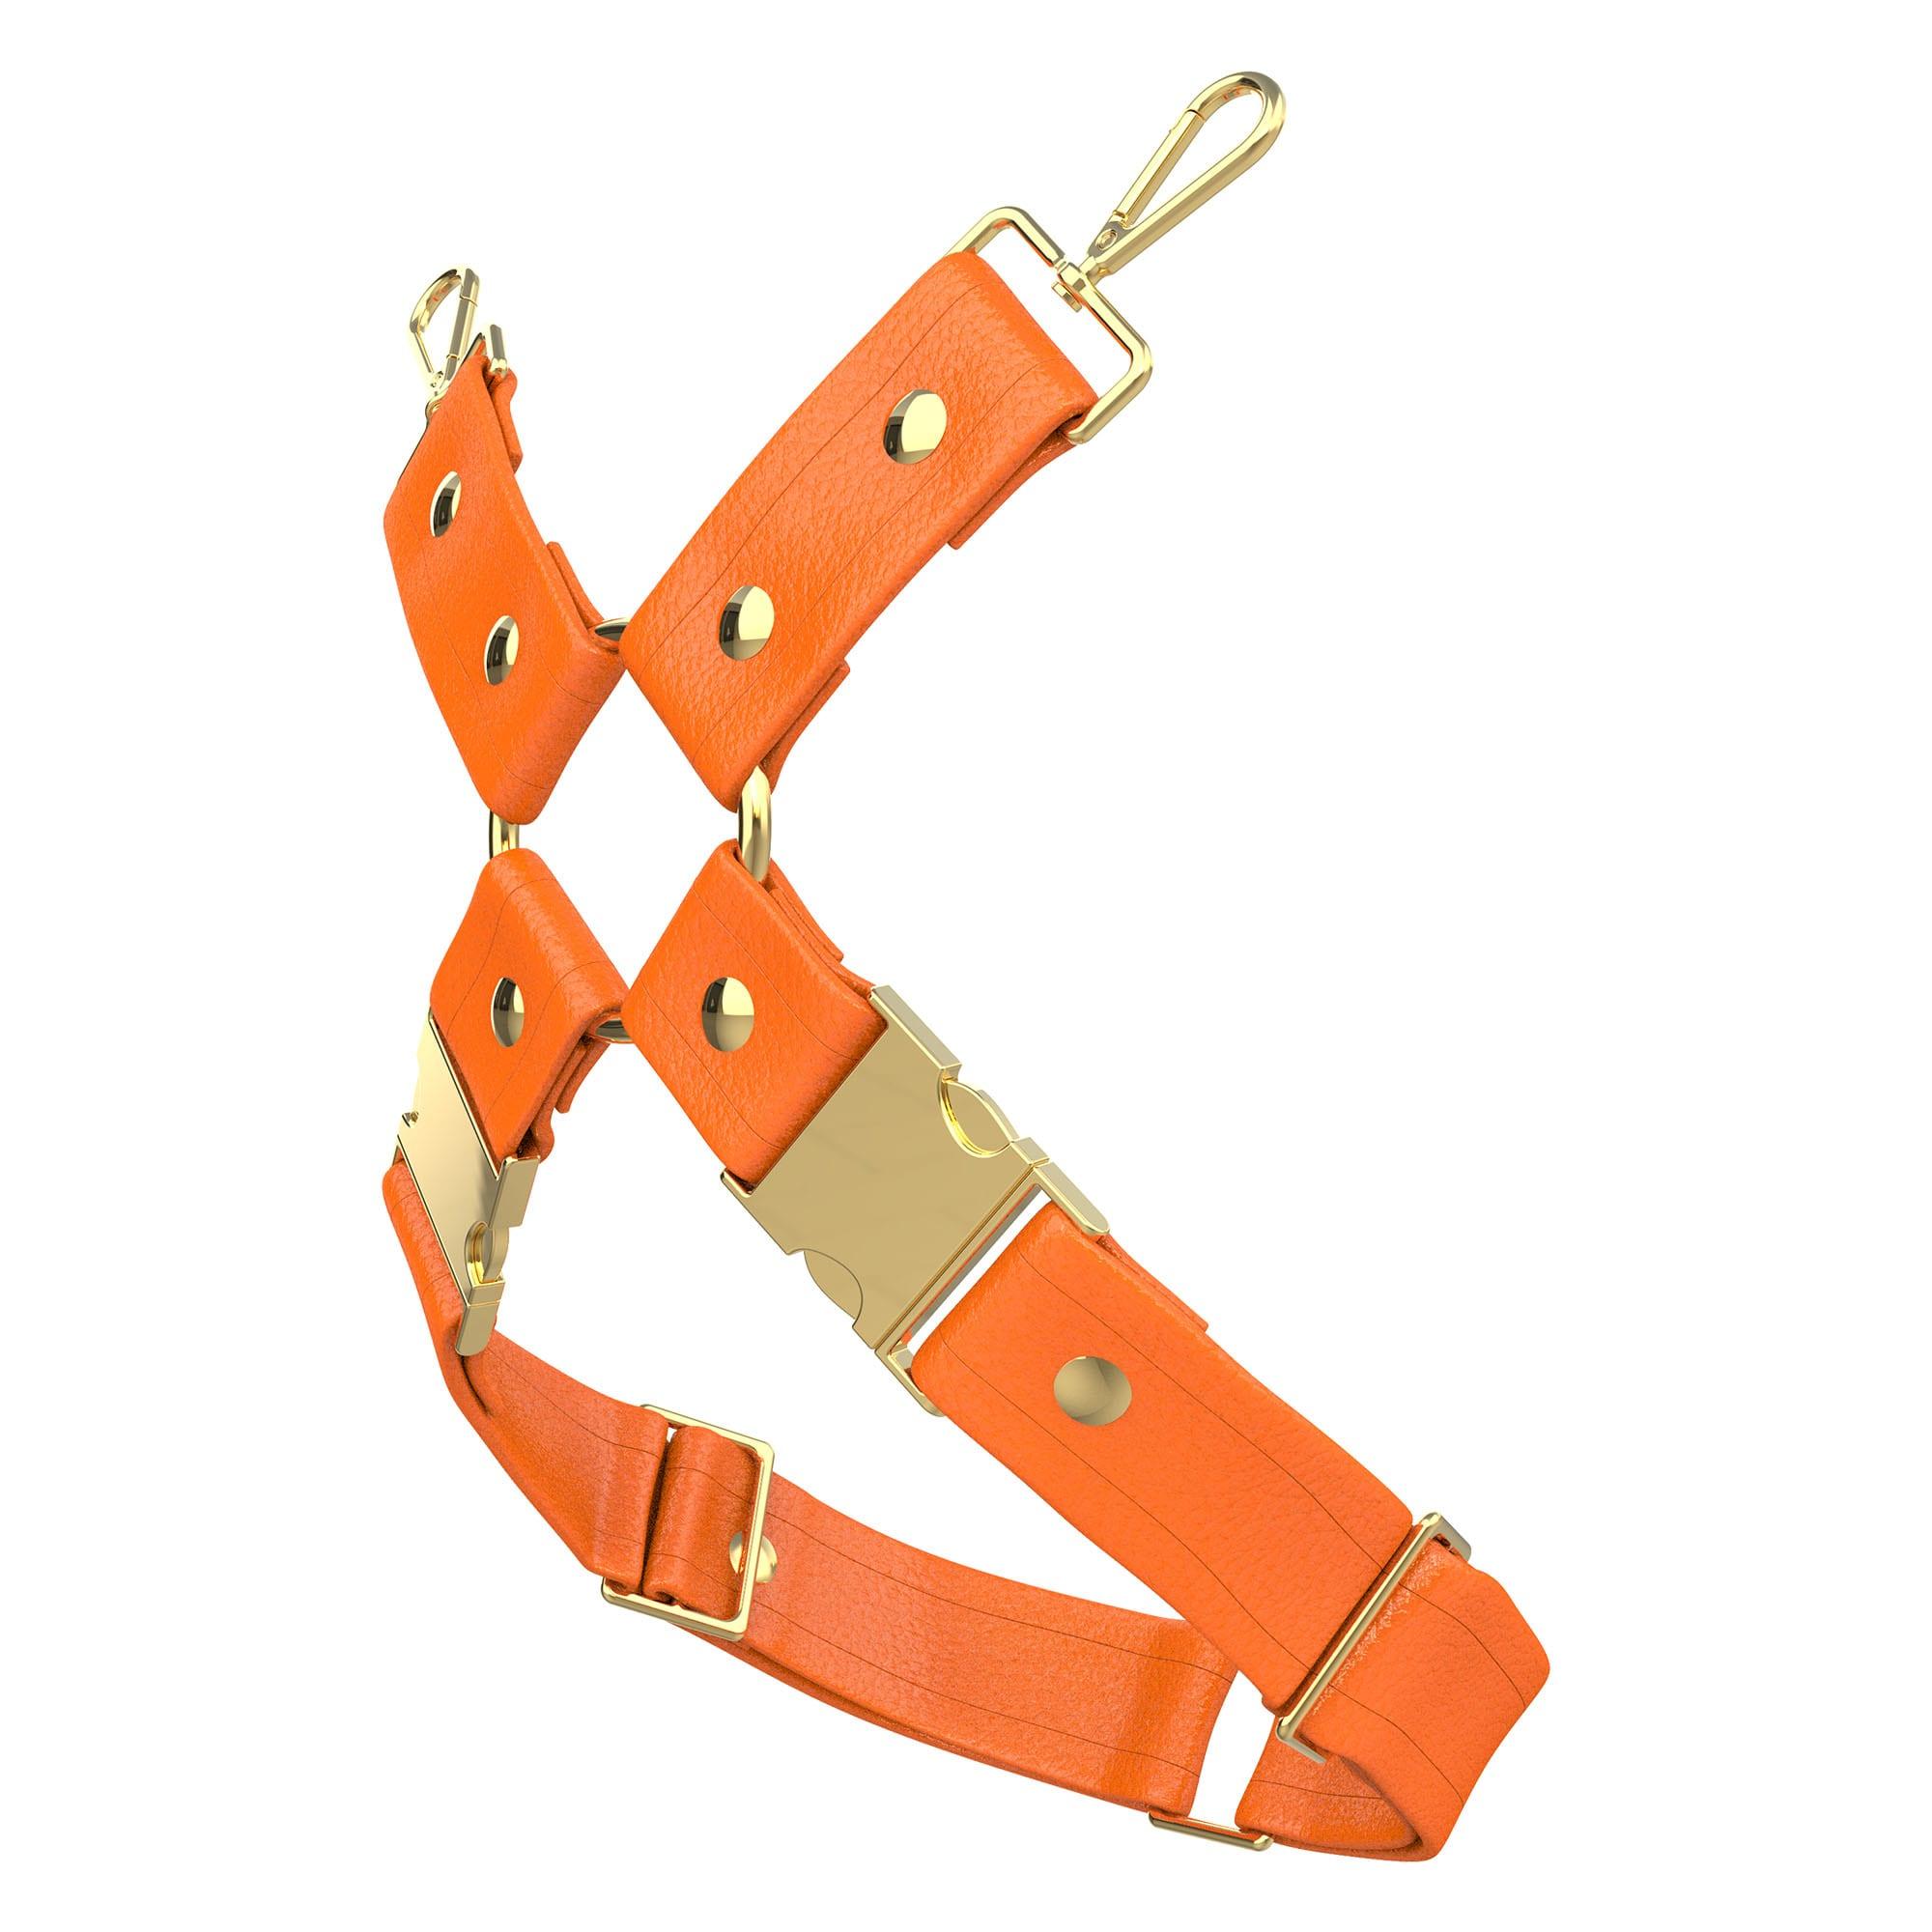 One Size Leg Harness – Standard Leather – Orange - Gold Metal Fittings